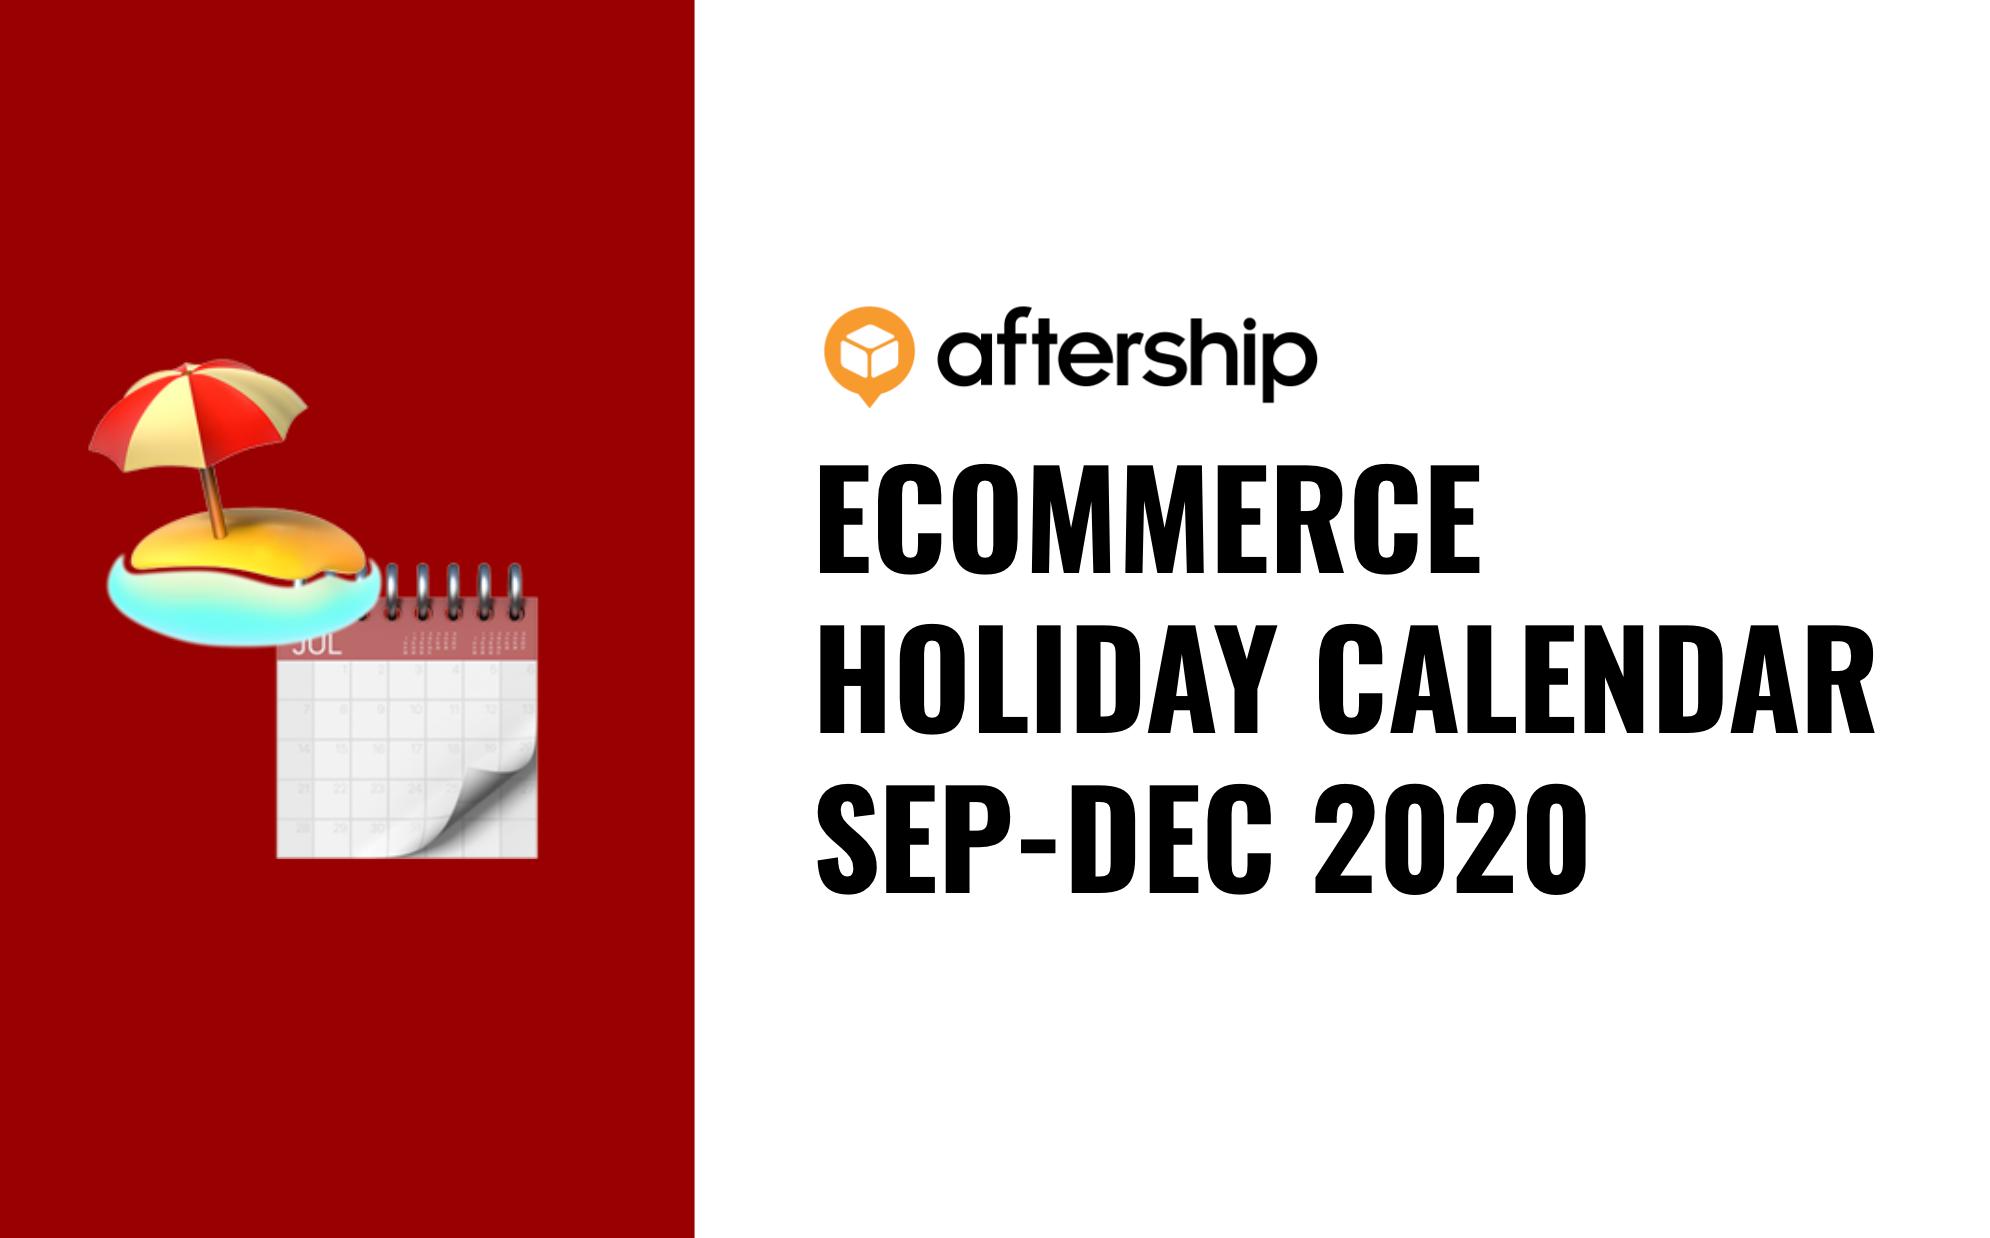 eCommerce Holiday Calendar: September to December 2020